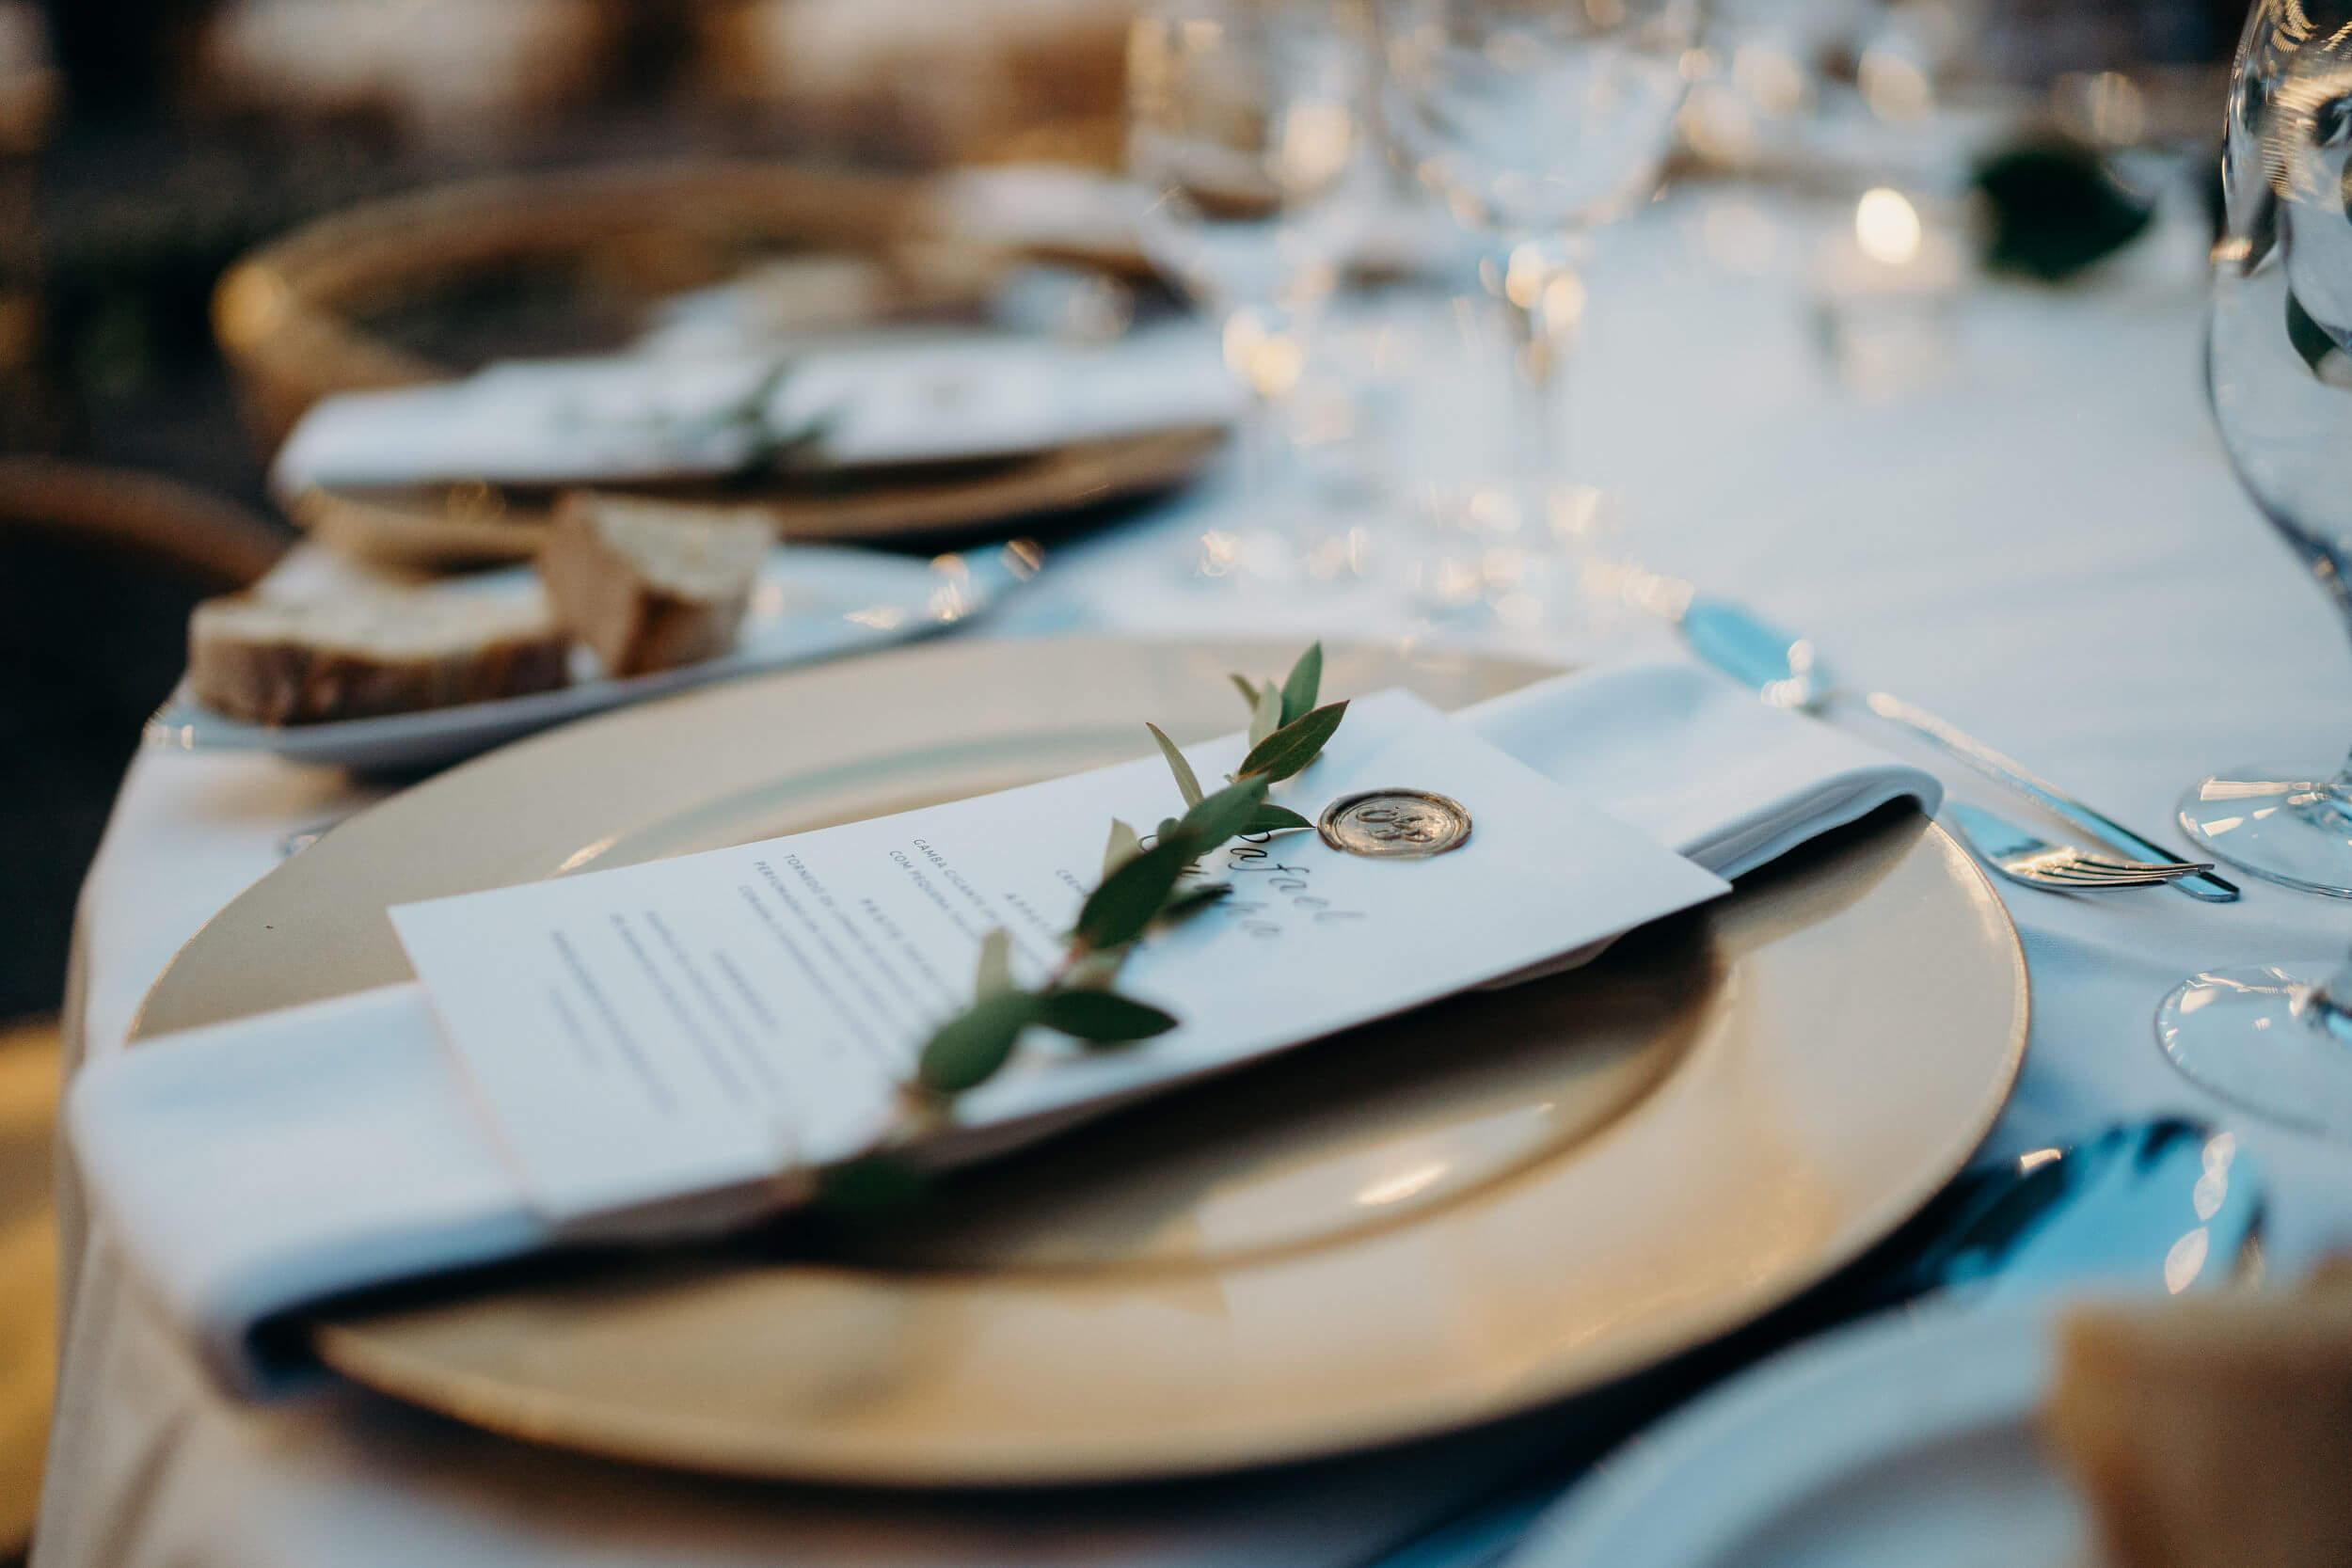 roma-organizacao-eventos-casamento-ana-e-pedro-22